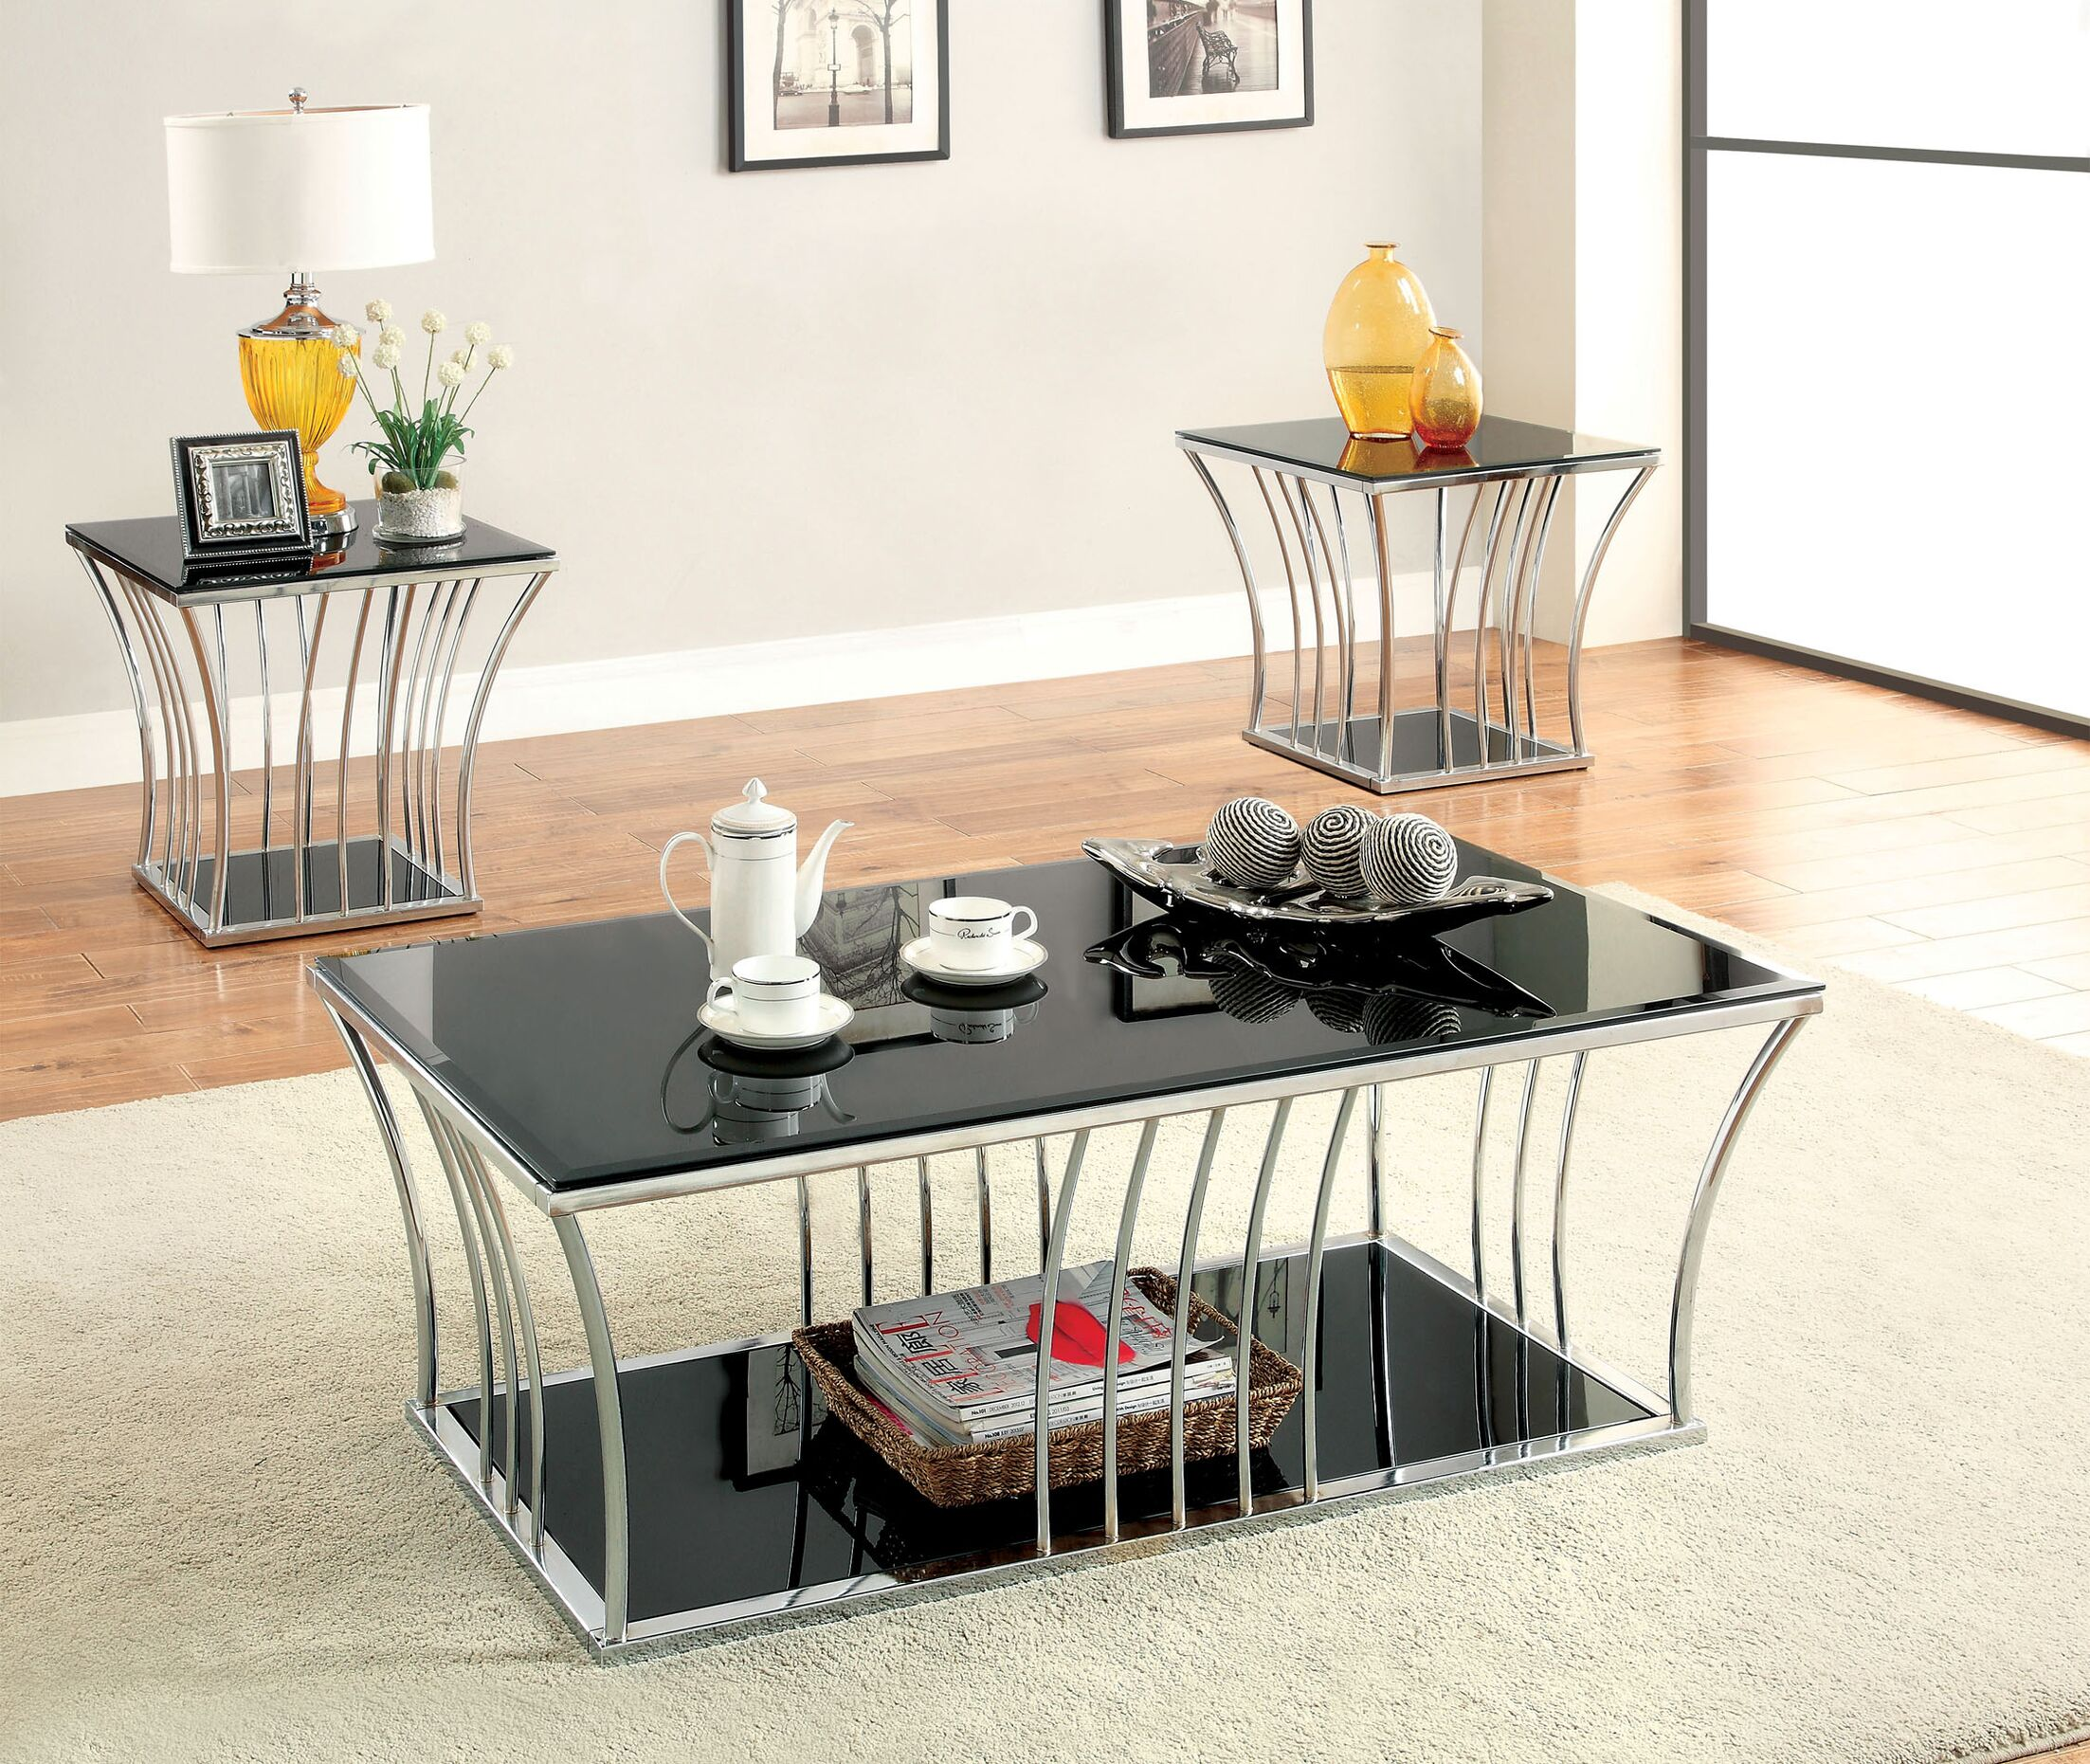 Villaine 2 Piece Coffee Table Set